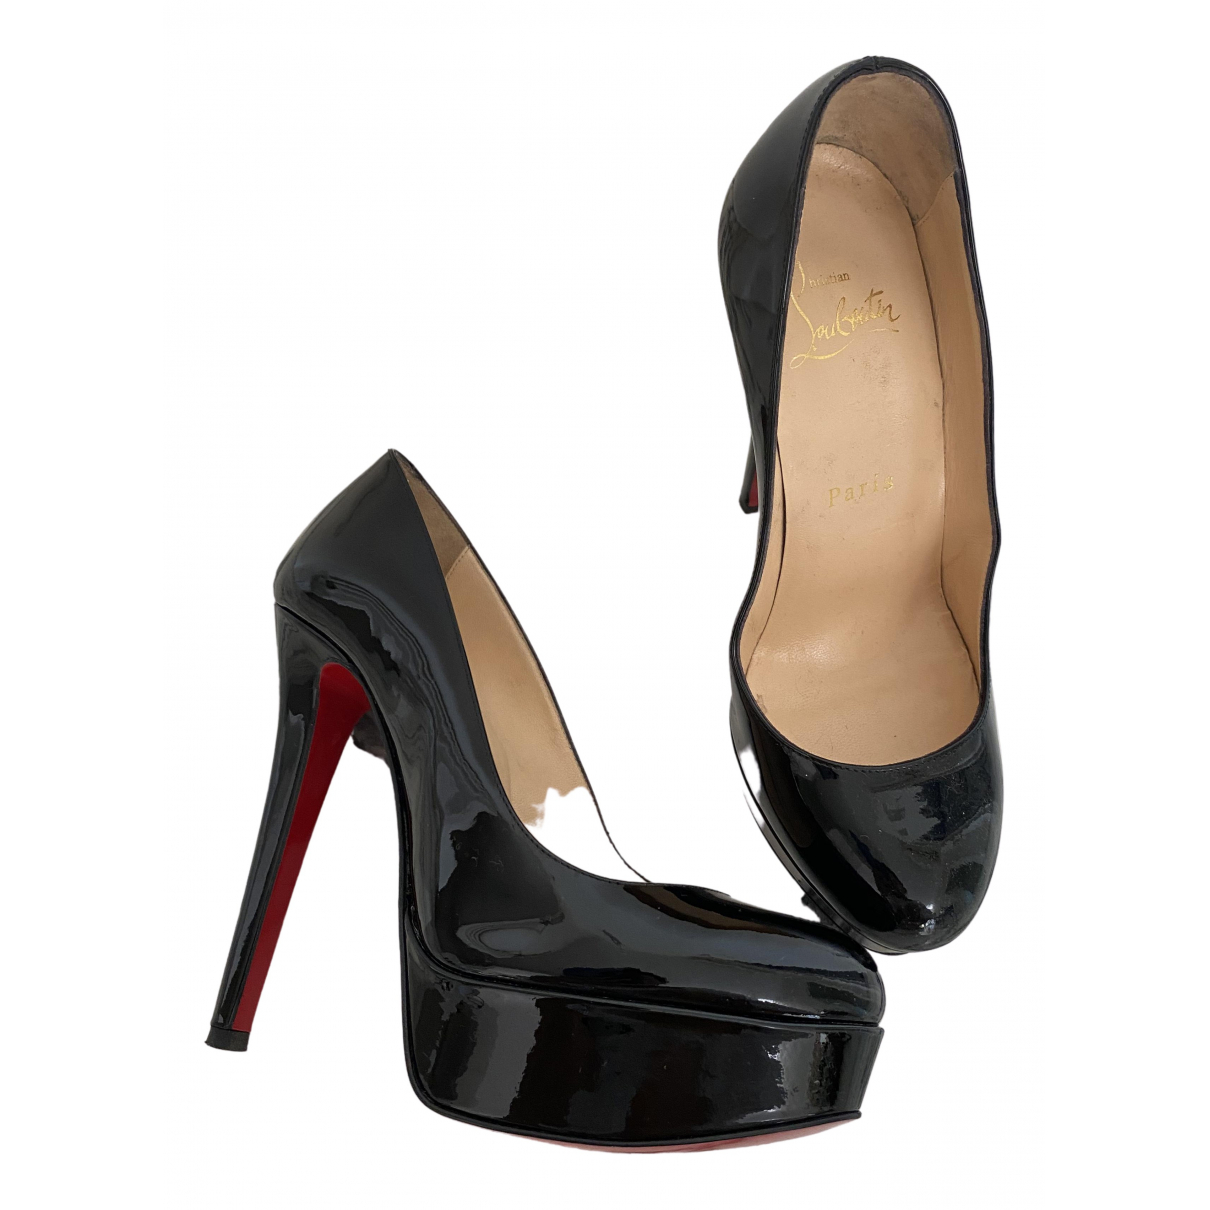 Christian Louboutin Bianca Black Patent leather Heels for Women 35.5 EU